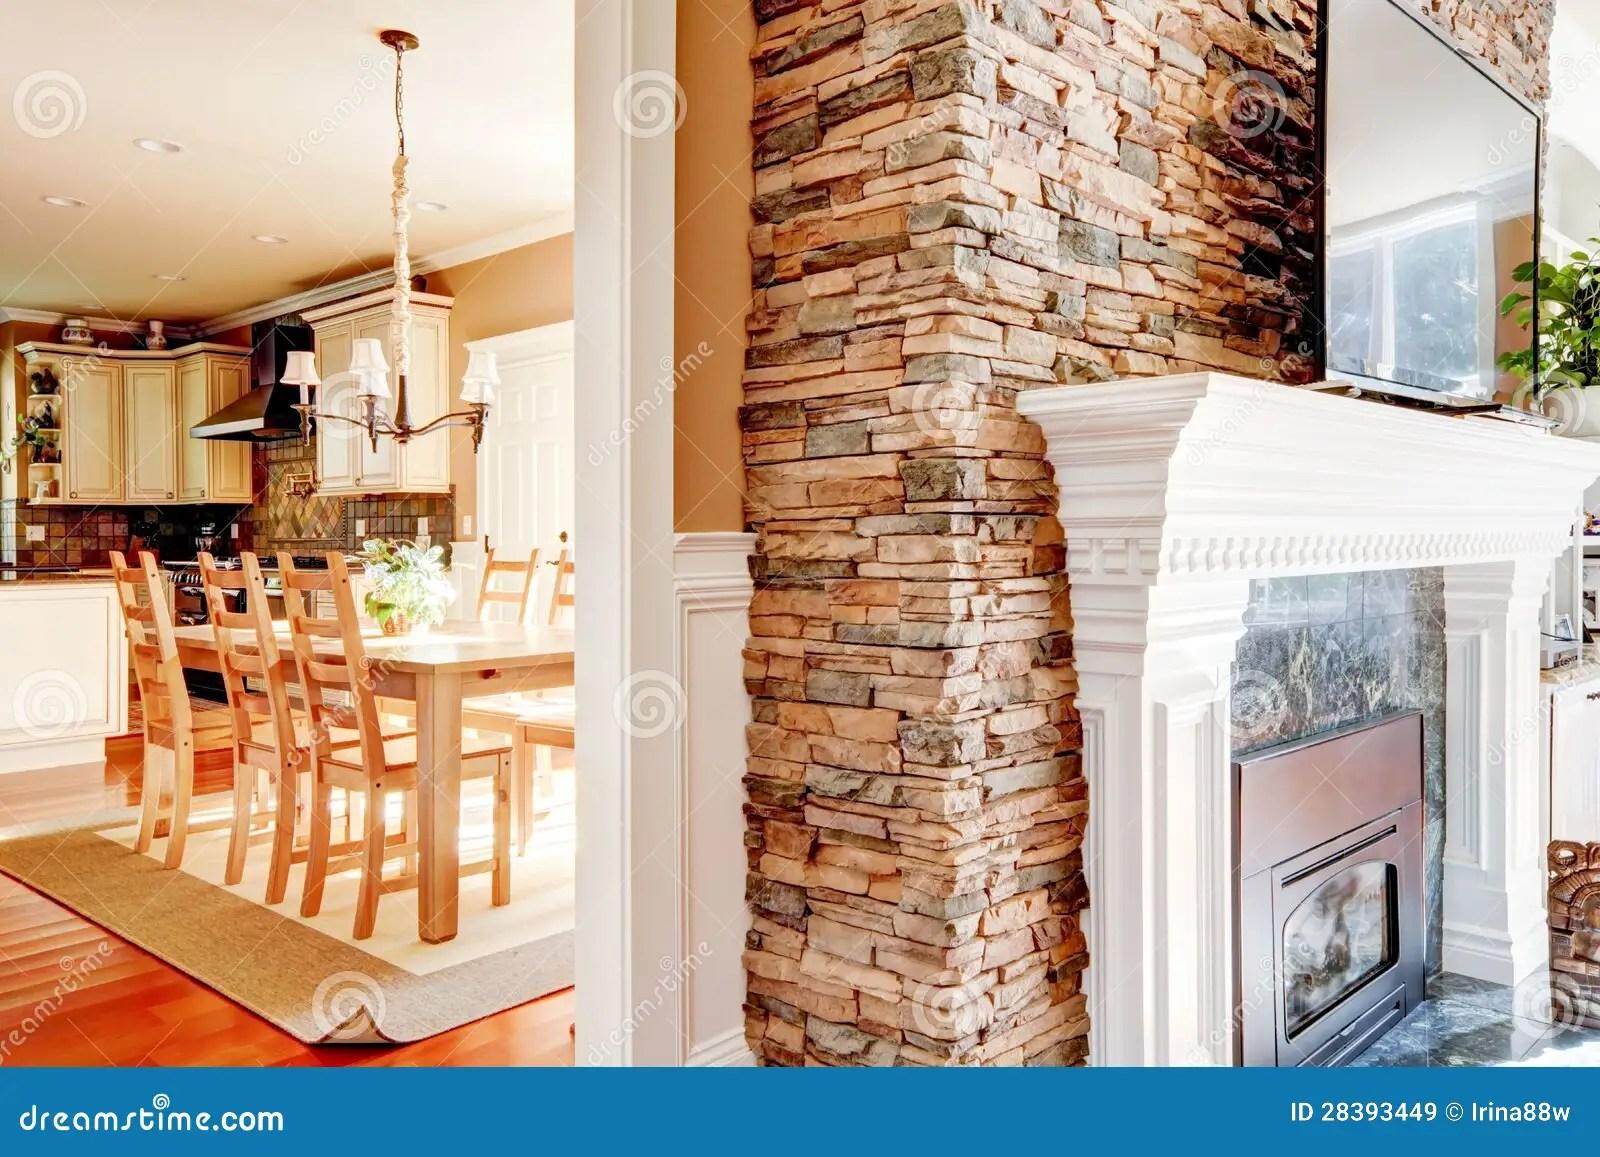 Eetkamer Keuken Open : Open haard in eetkamer keuken dressoir fresh gashaard open haard